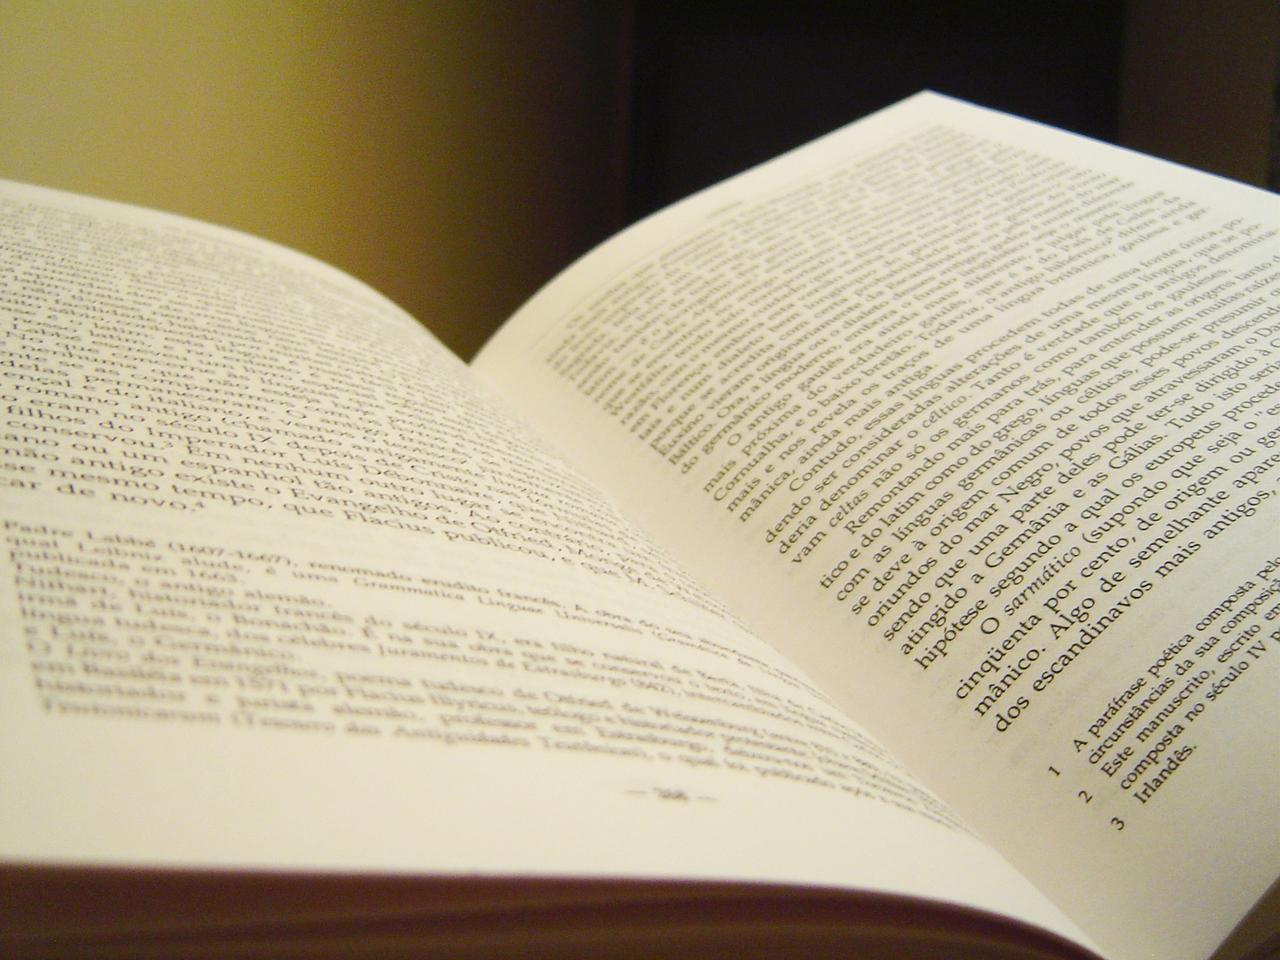 open-book-1546443-1280x960